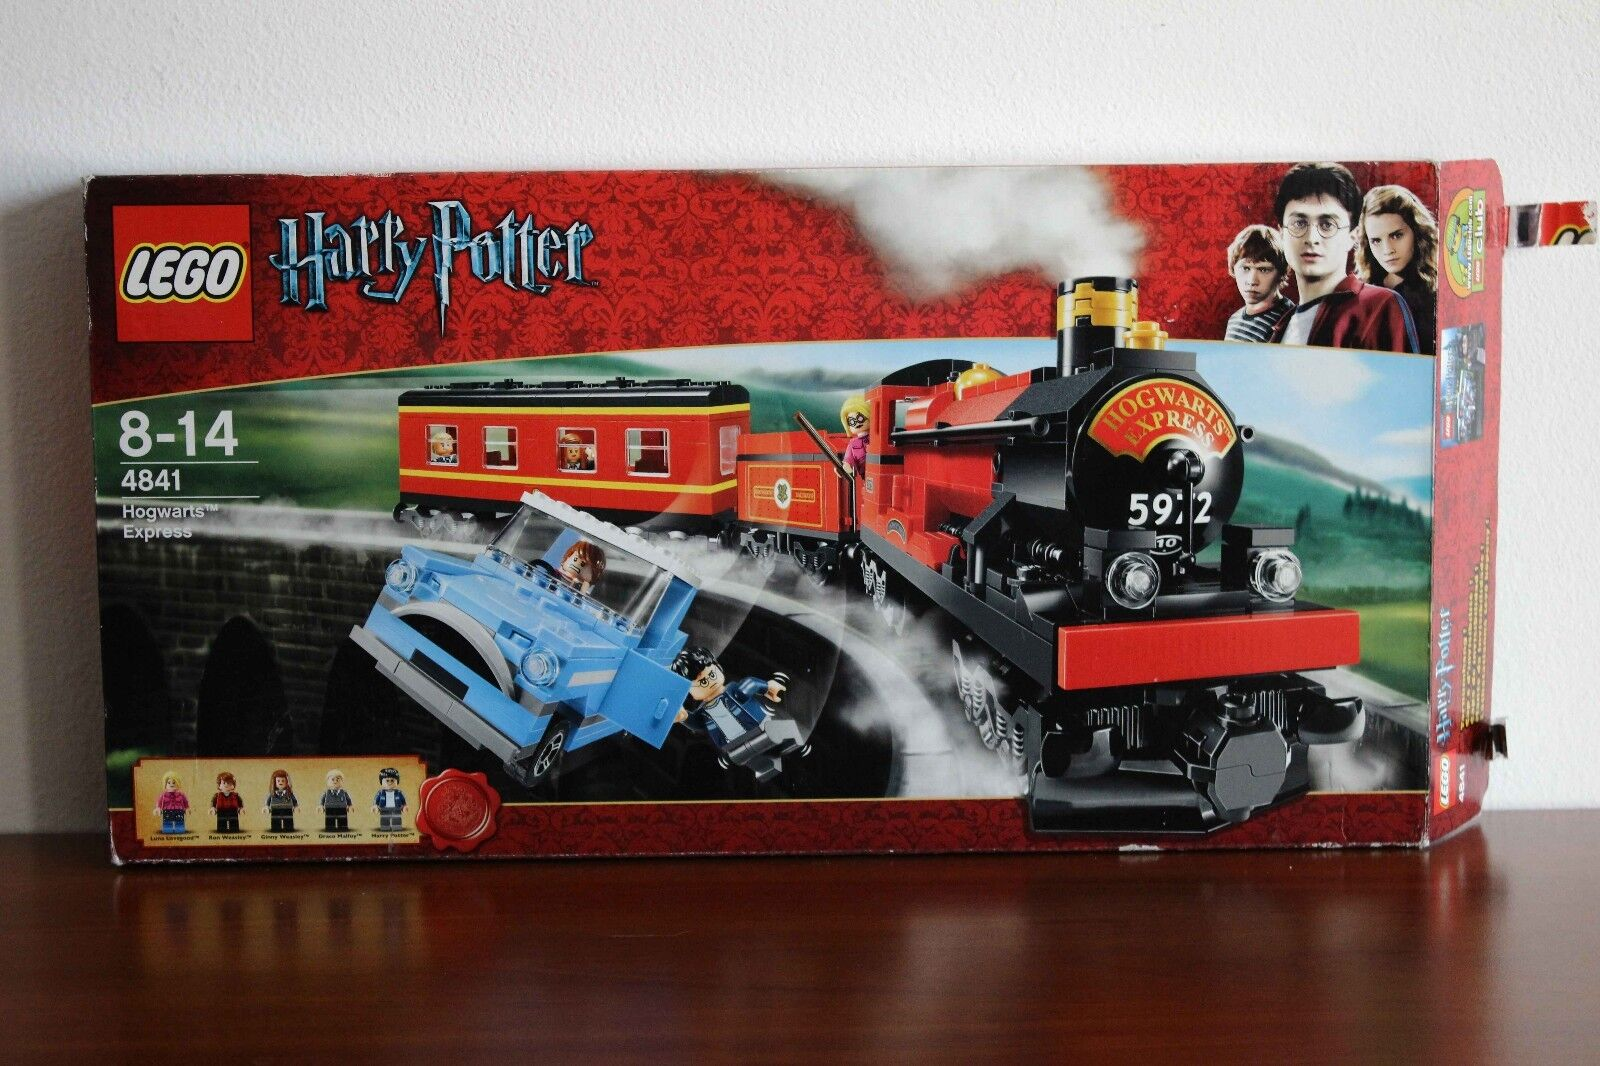 Lego Harry Potter Set  4841-1 Hogwarts Express 100% cmpl. + instr. e scatola  all'ingrosso a buon mercato